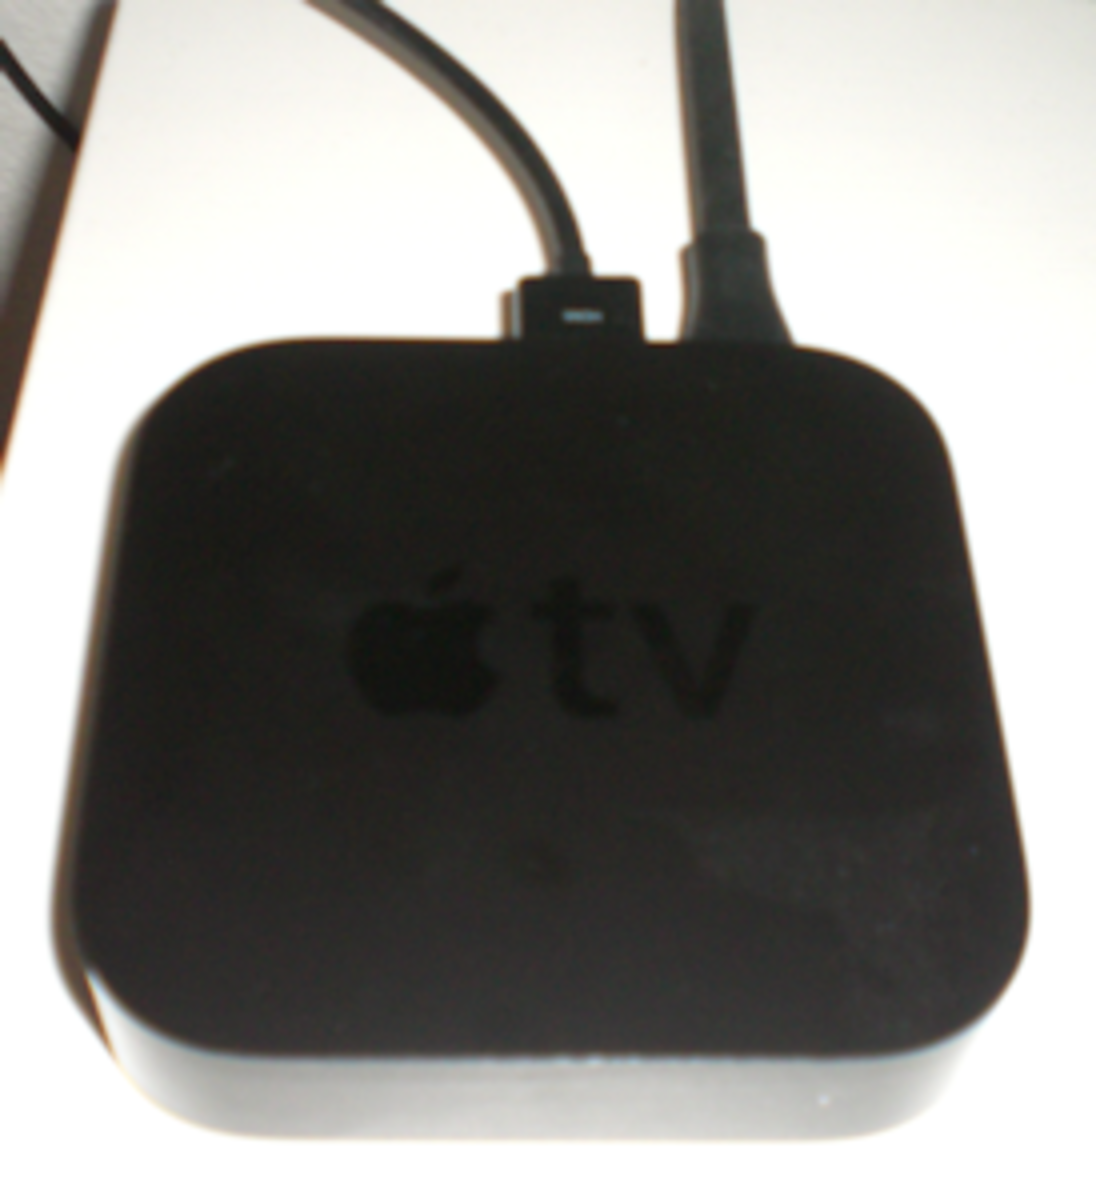 Apple TV in use.